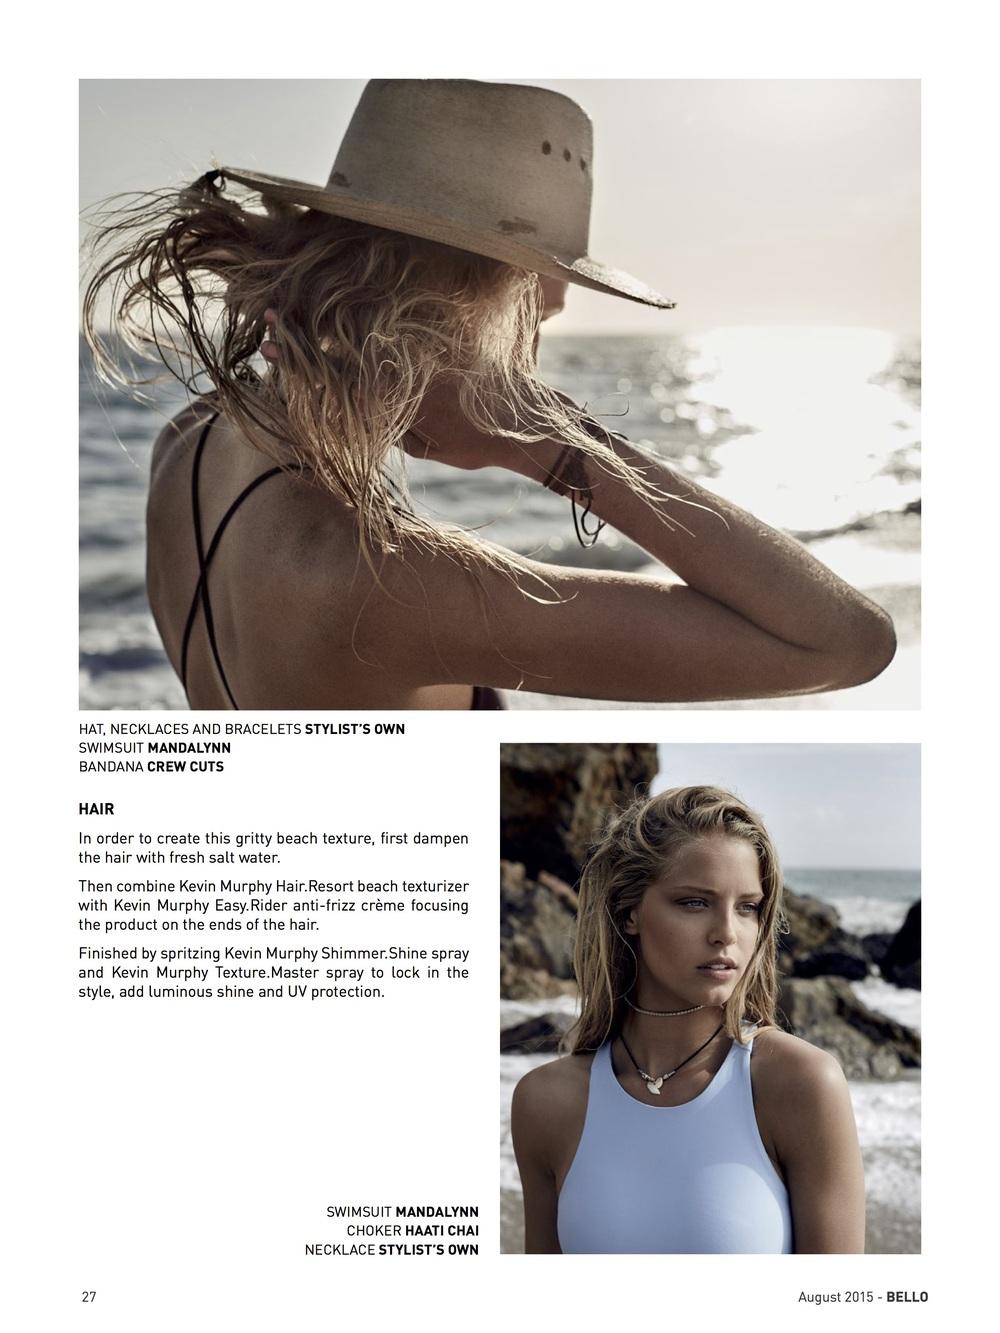 BELLO Beauty August 2015 (dragged) 10.jpg